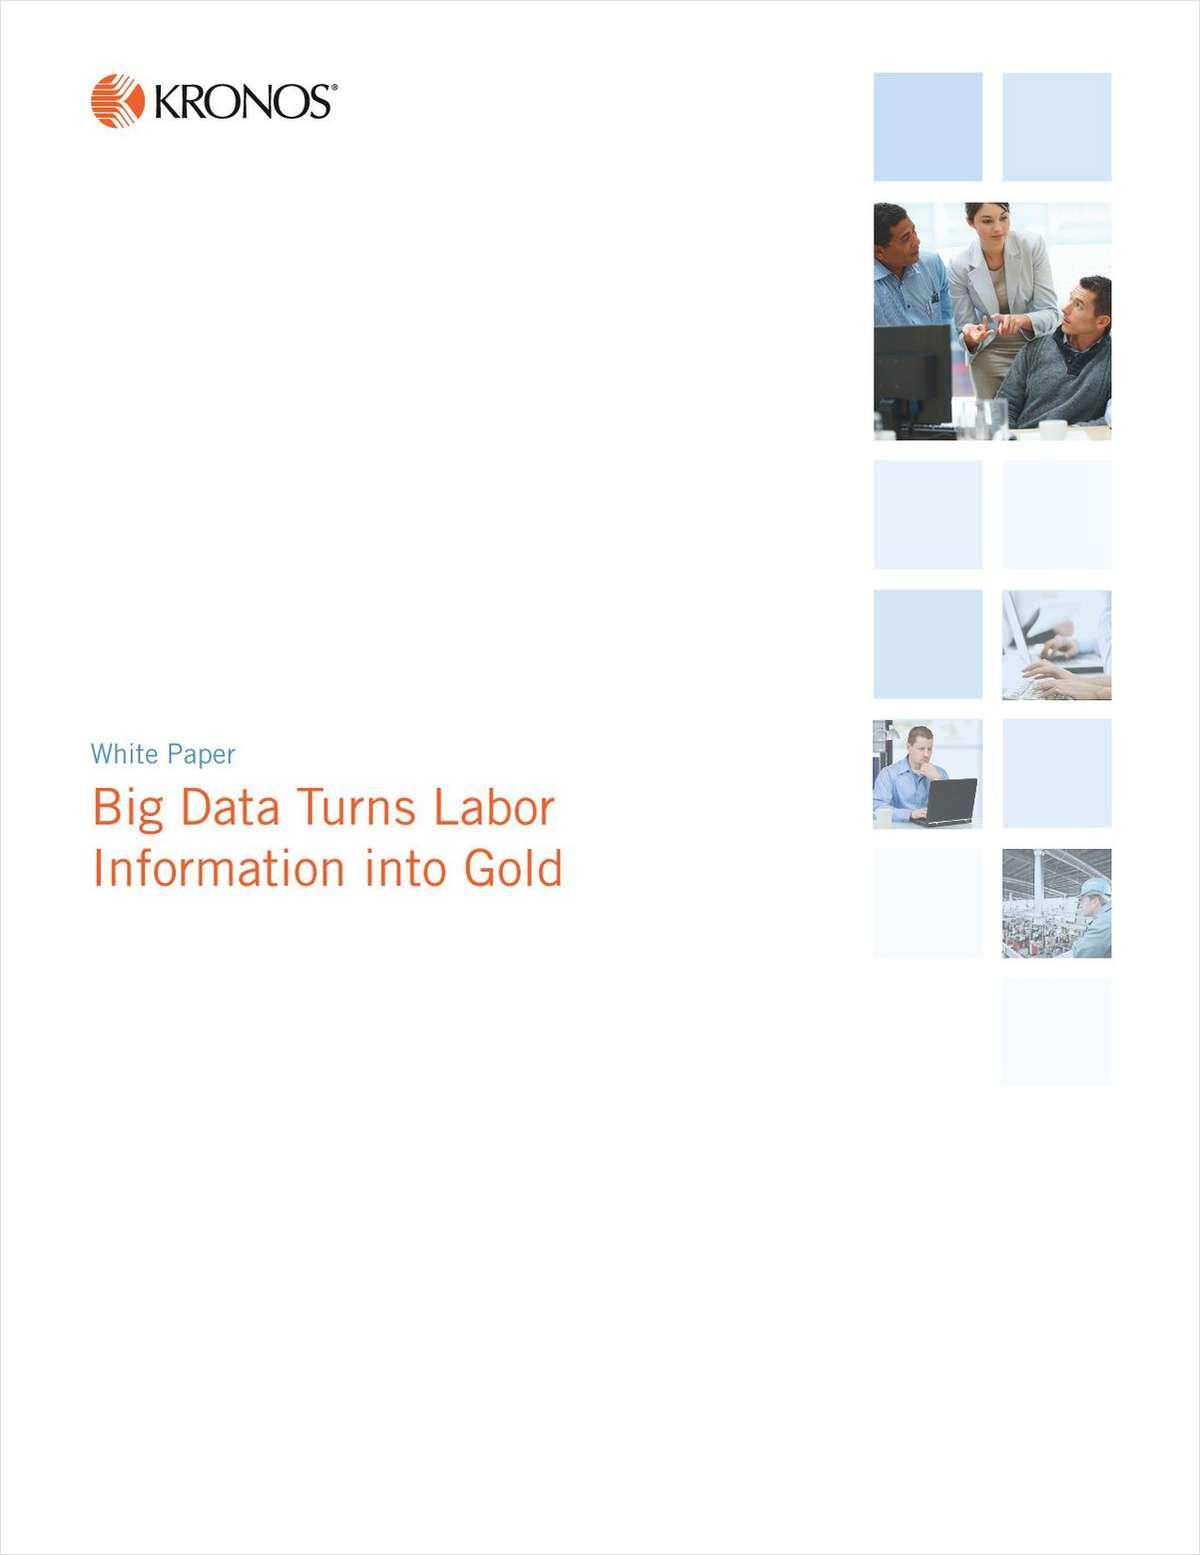 Big Data Turns Labor Information into Gold